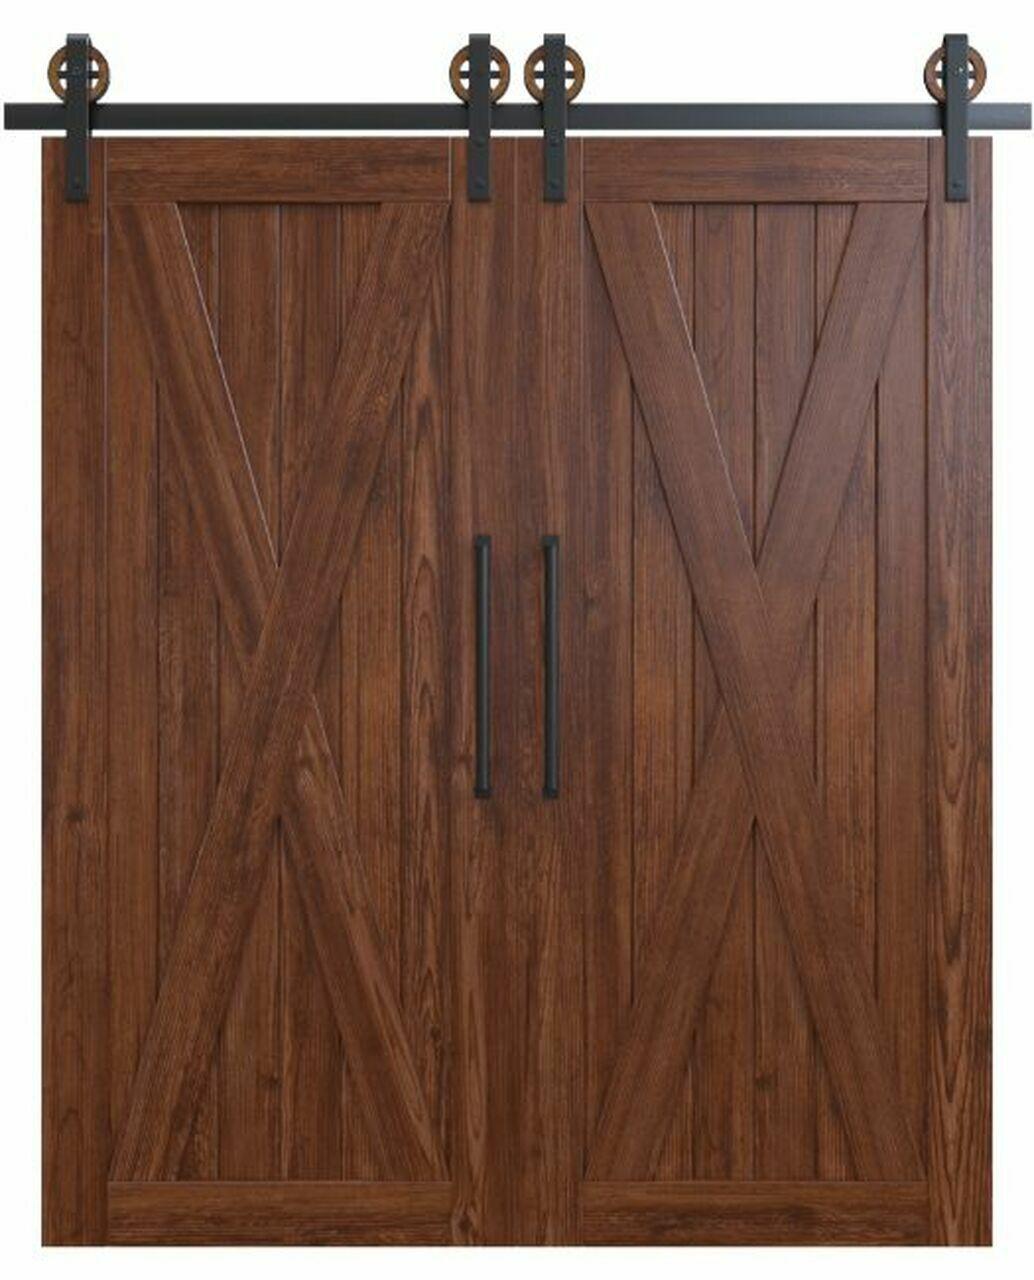 savannah savannah dark stained wood double barn door with classic full x panel